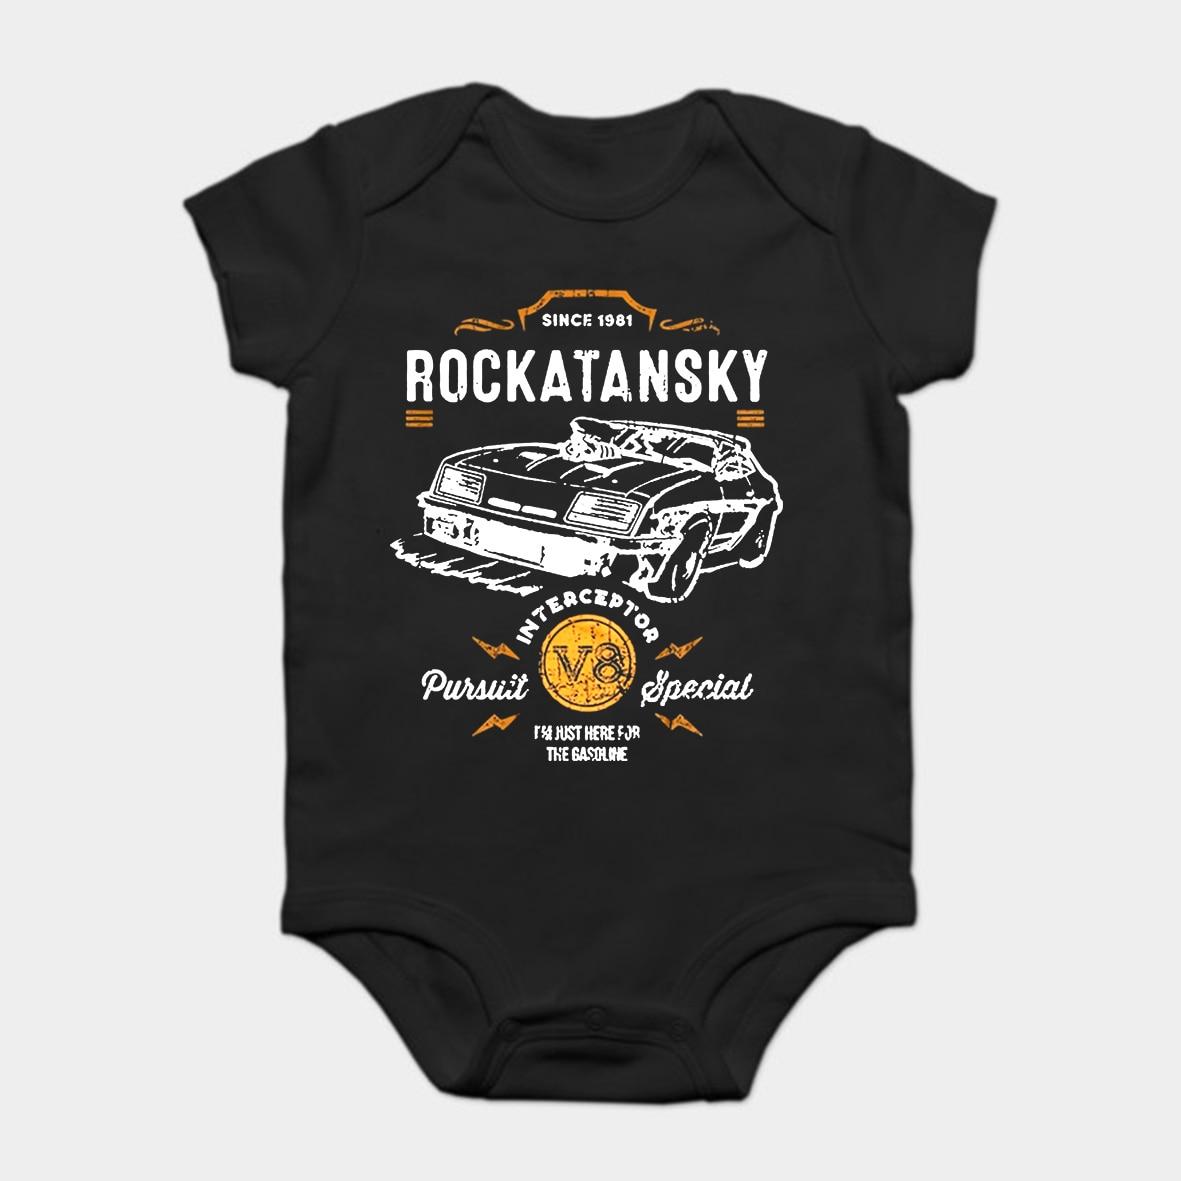 Baby Onesie Baby Bodysuits Kid T Shirt Mad Max Mfp Force Fury Road Verfolgung Interceptor V8 Elegant Shape